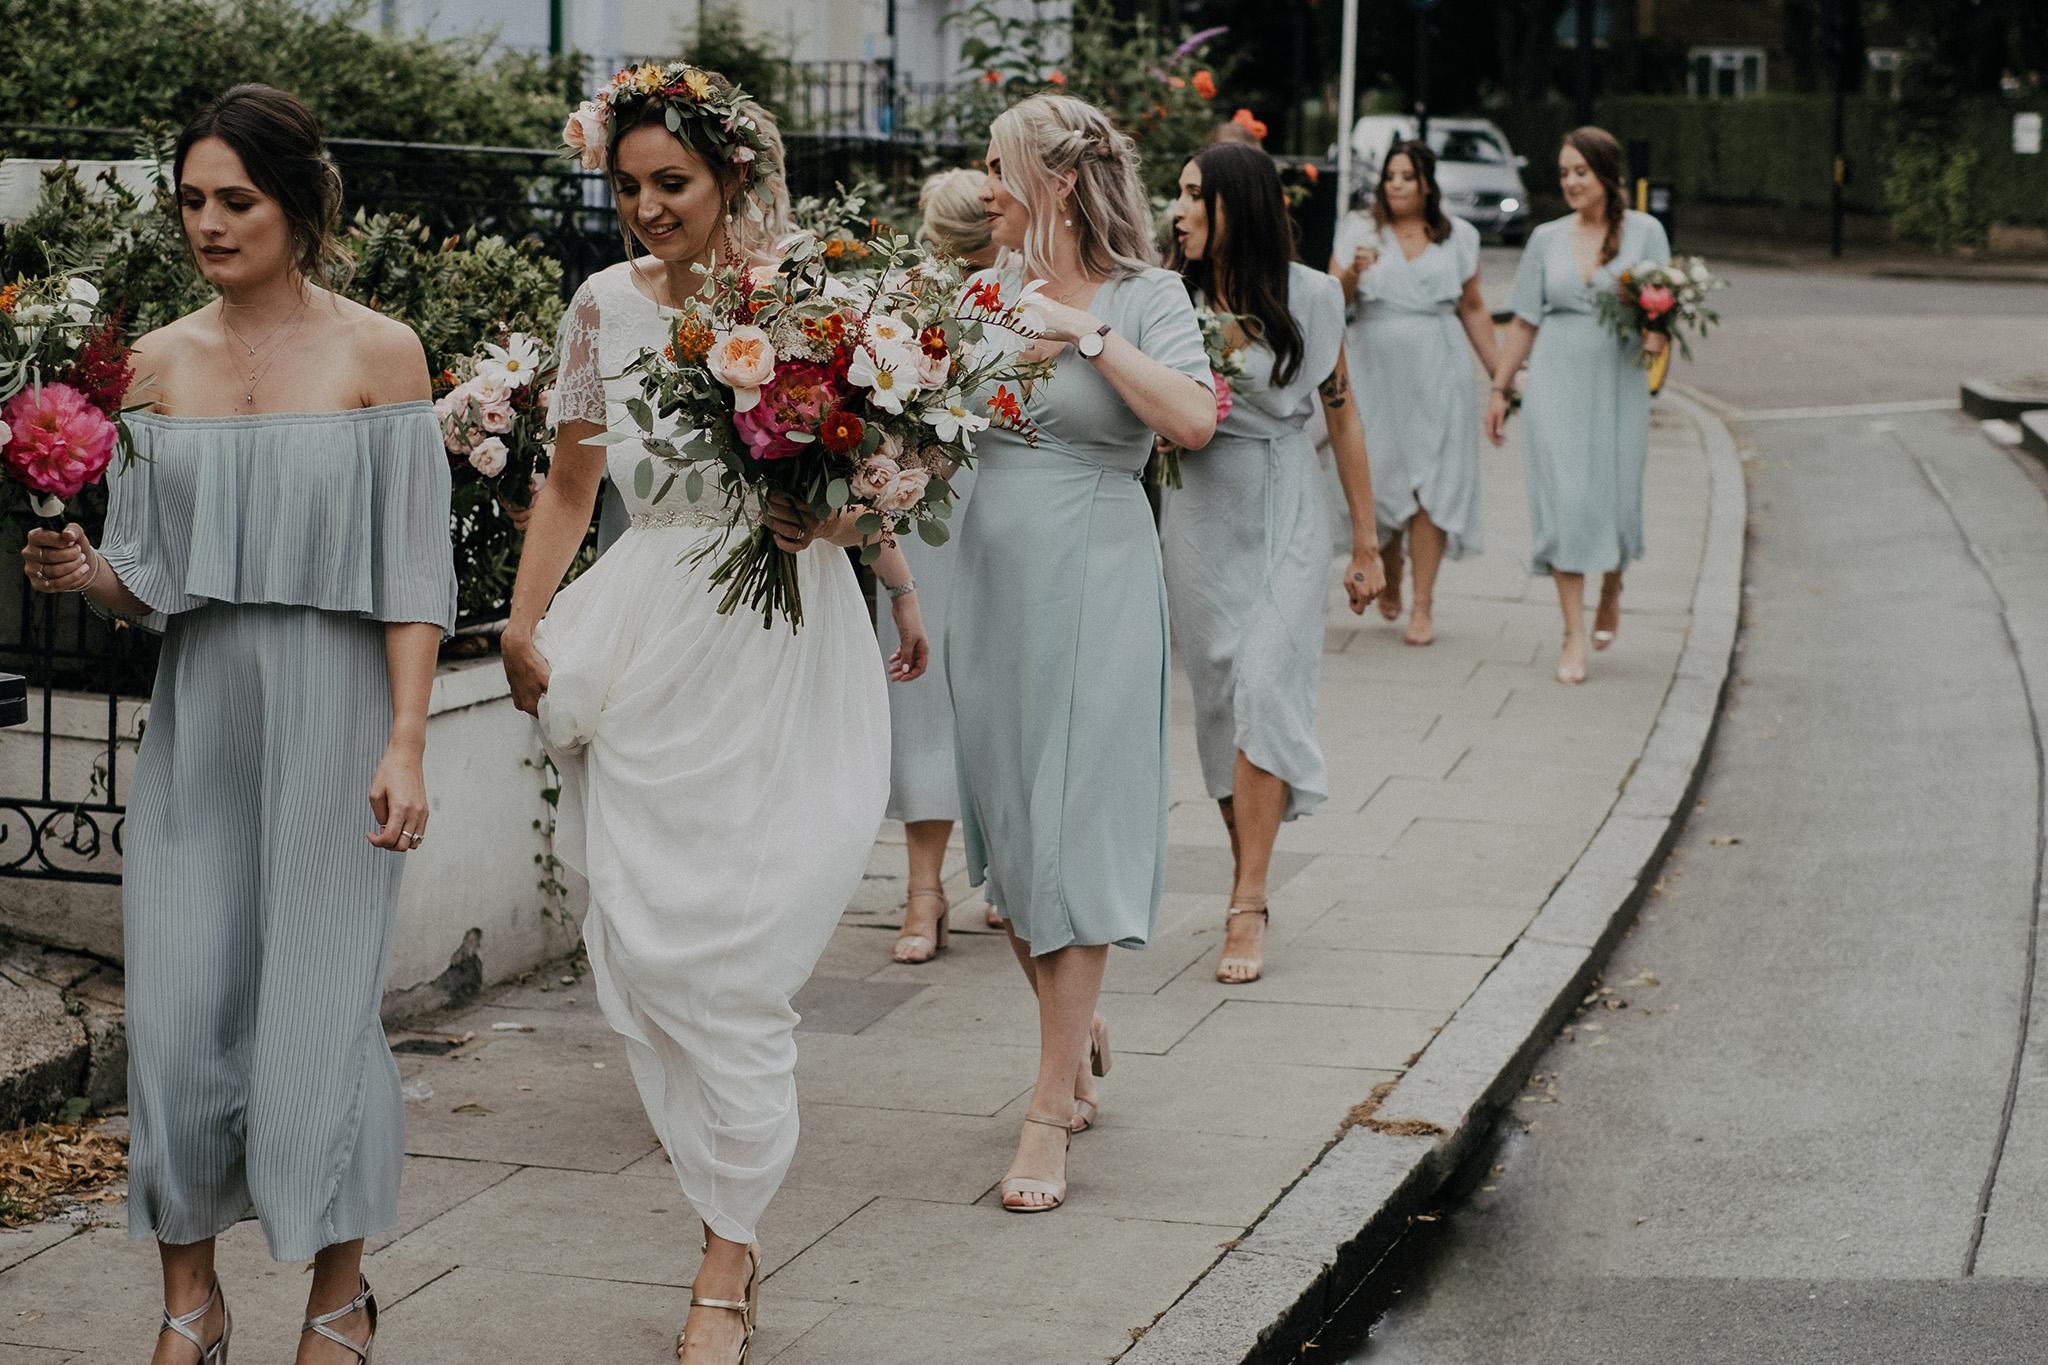 Islington-town-hall-wedding59.jpg